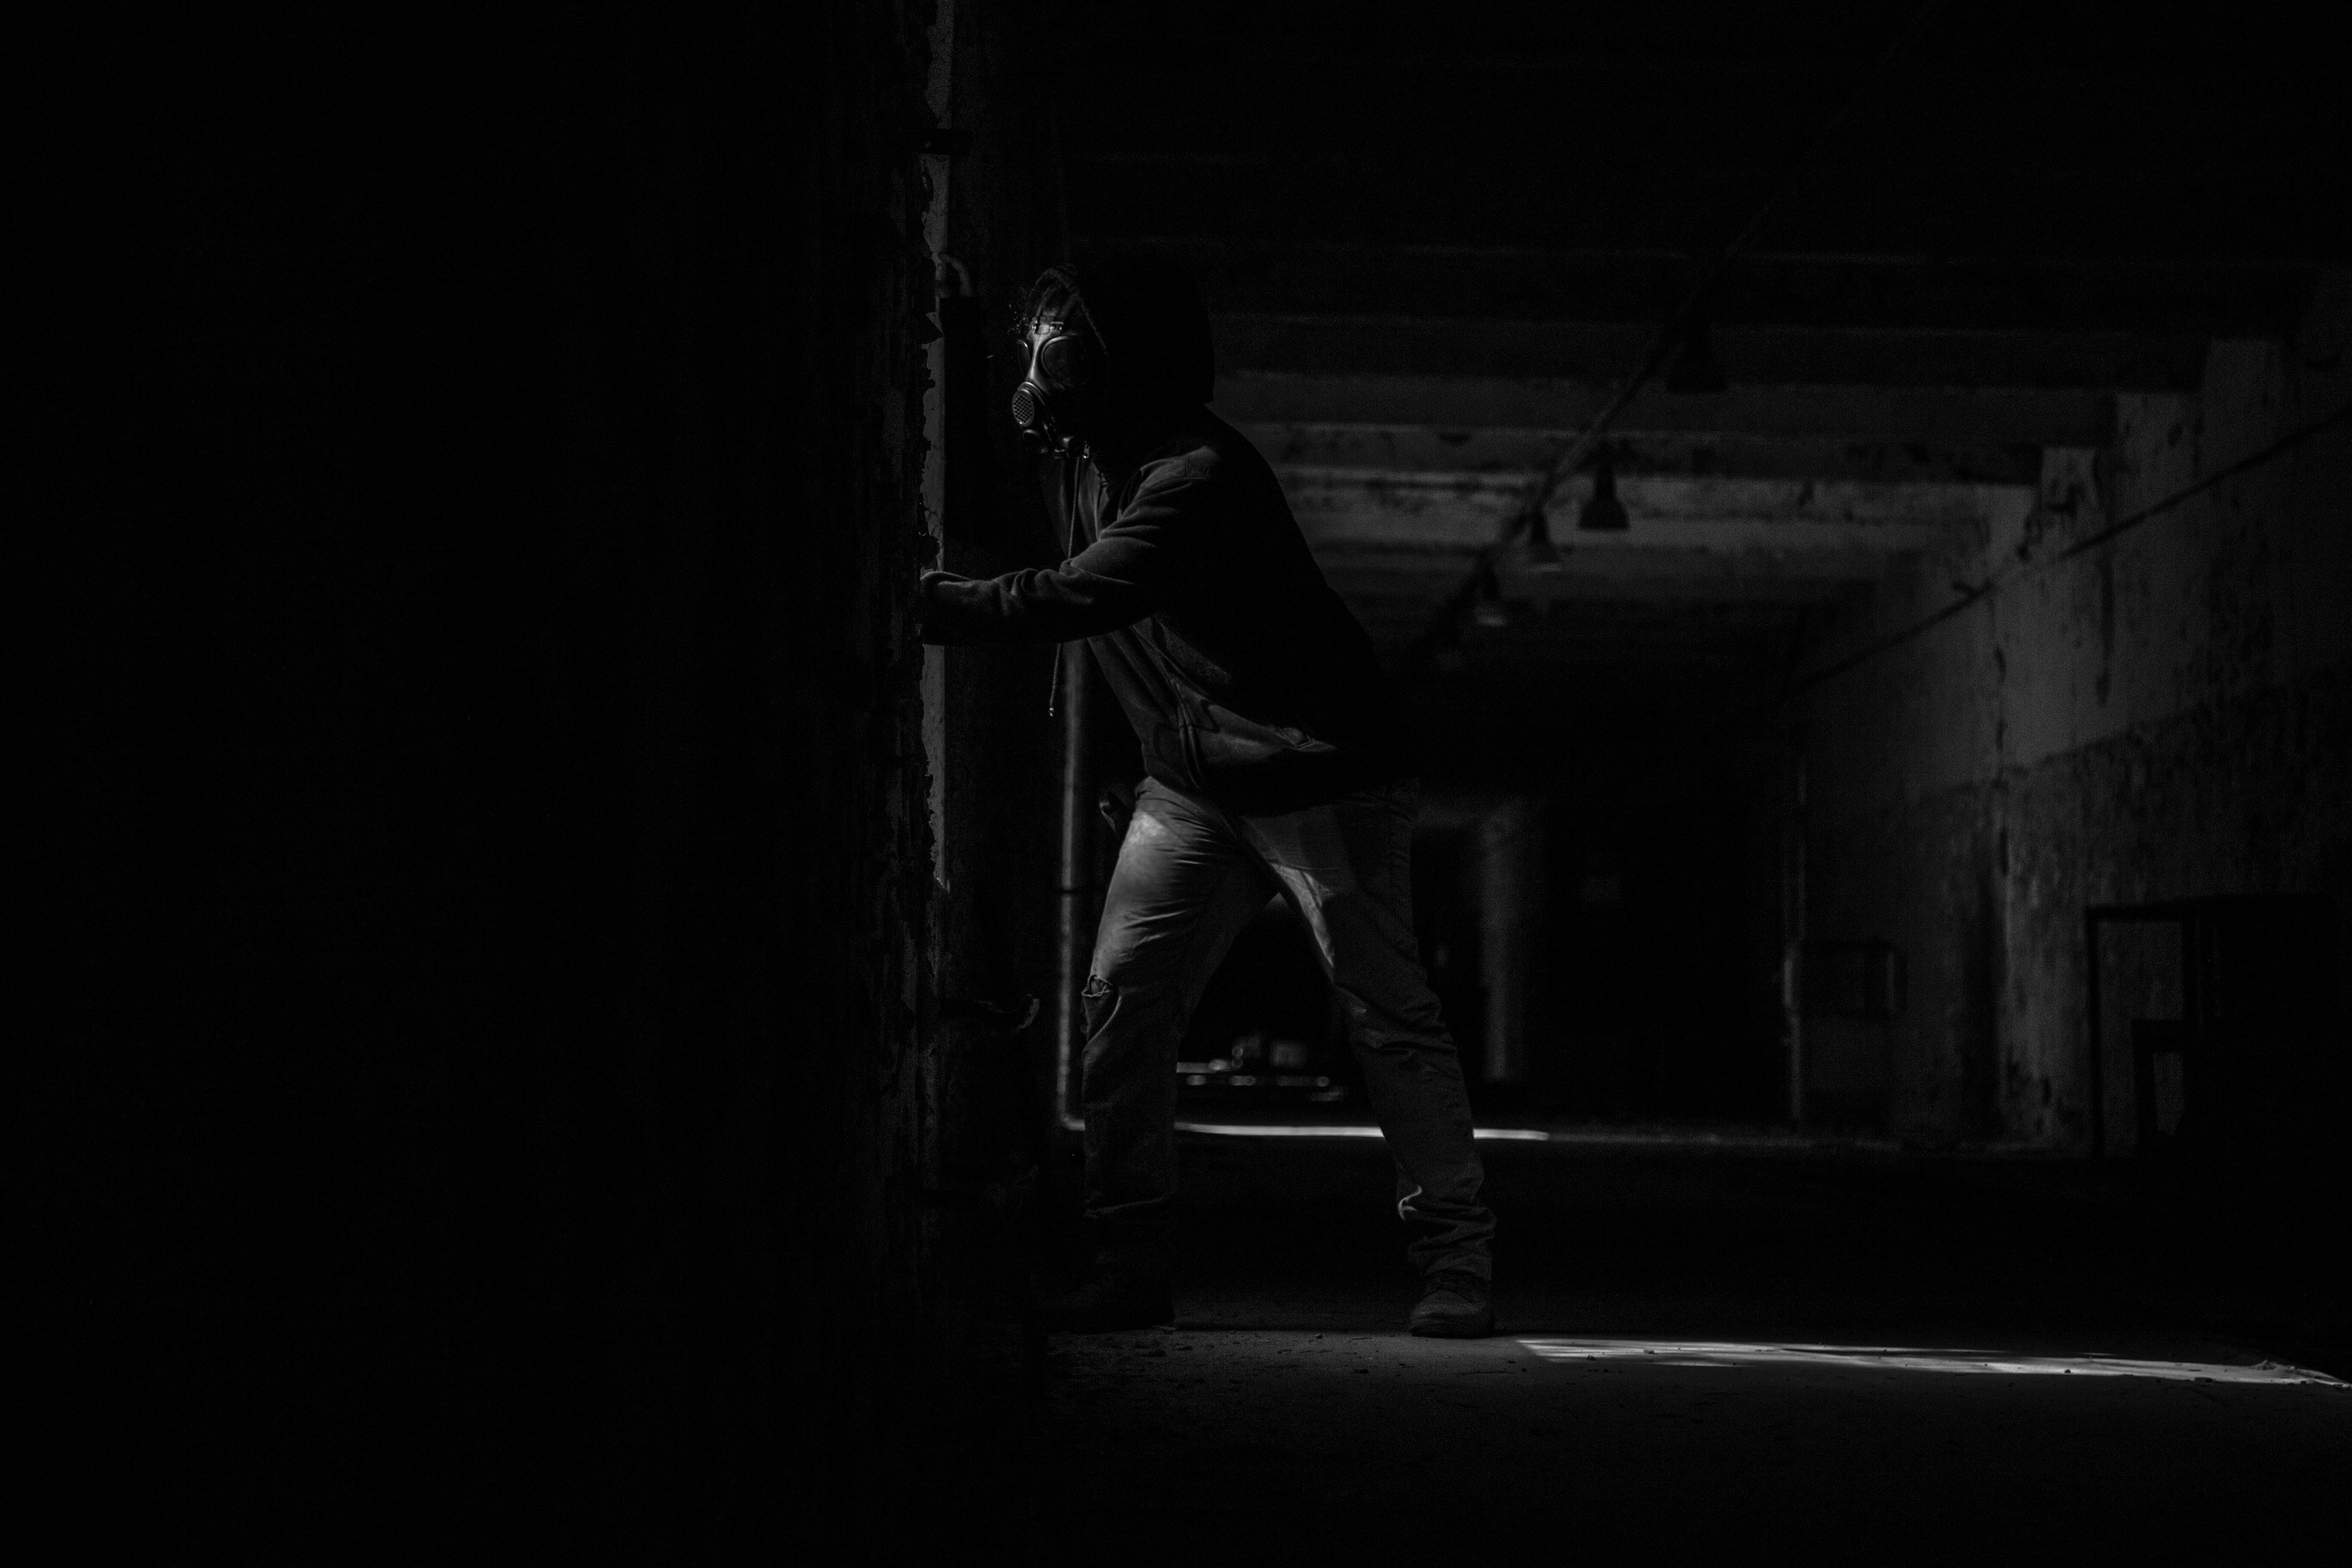 Person Wearing Mask Inside Dark Room